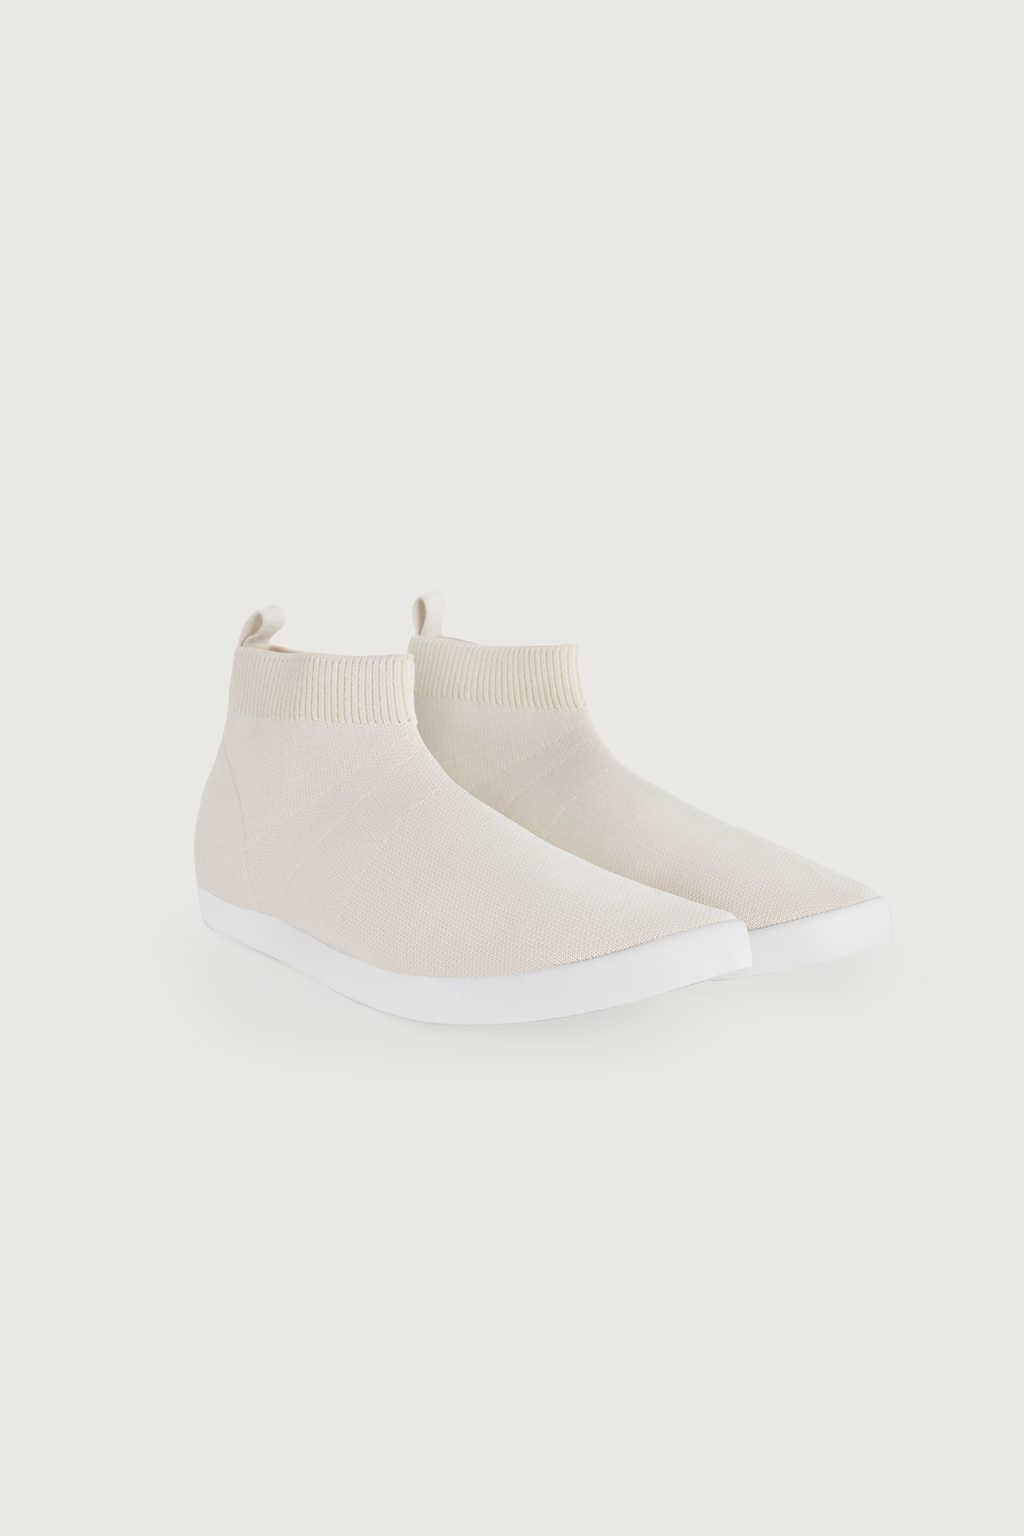 Sneaker 3334 Cream 2